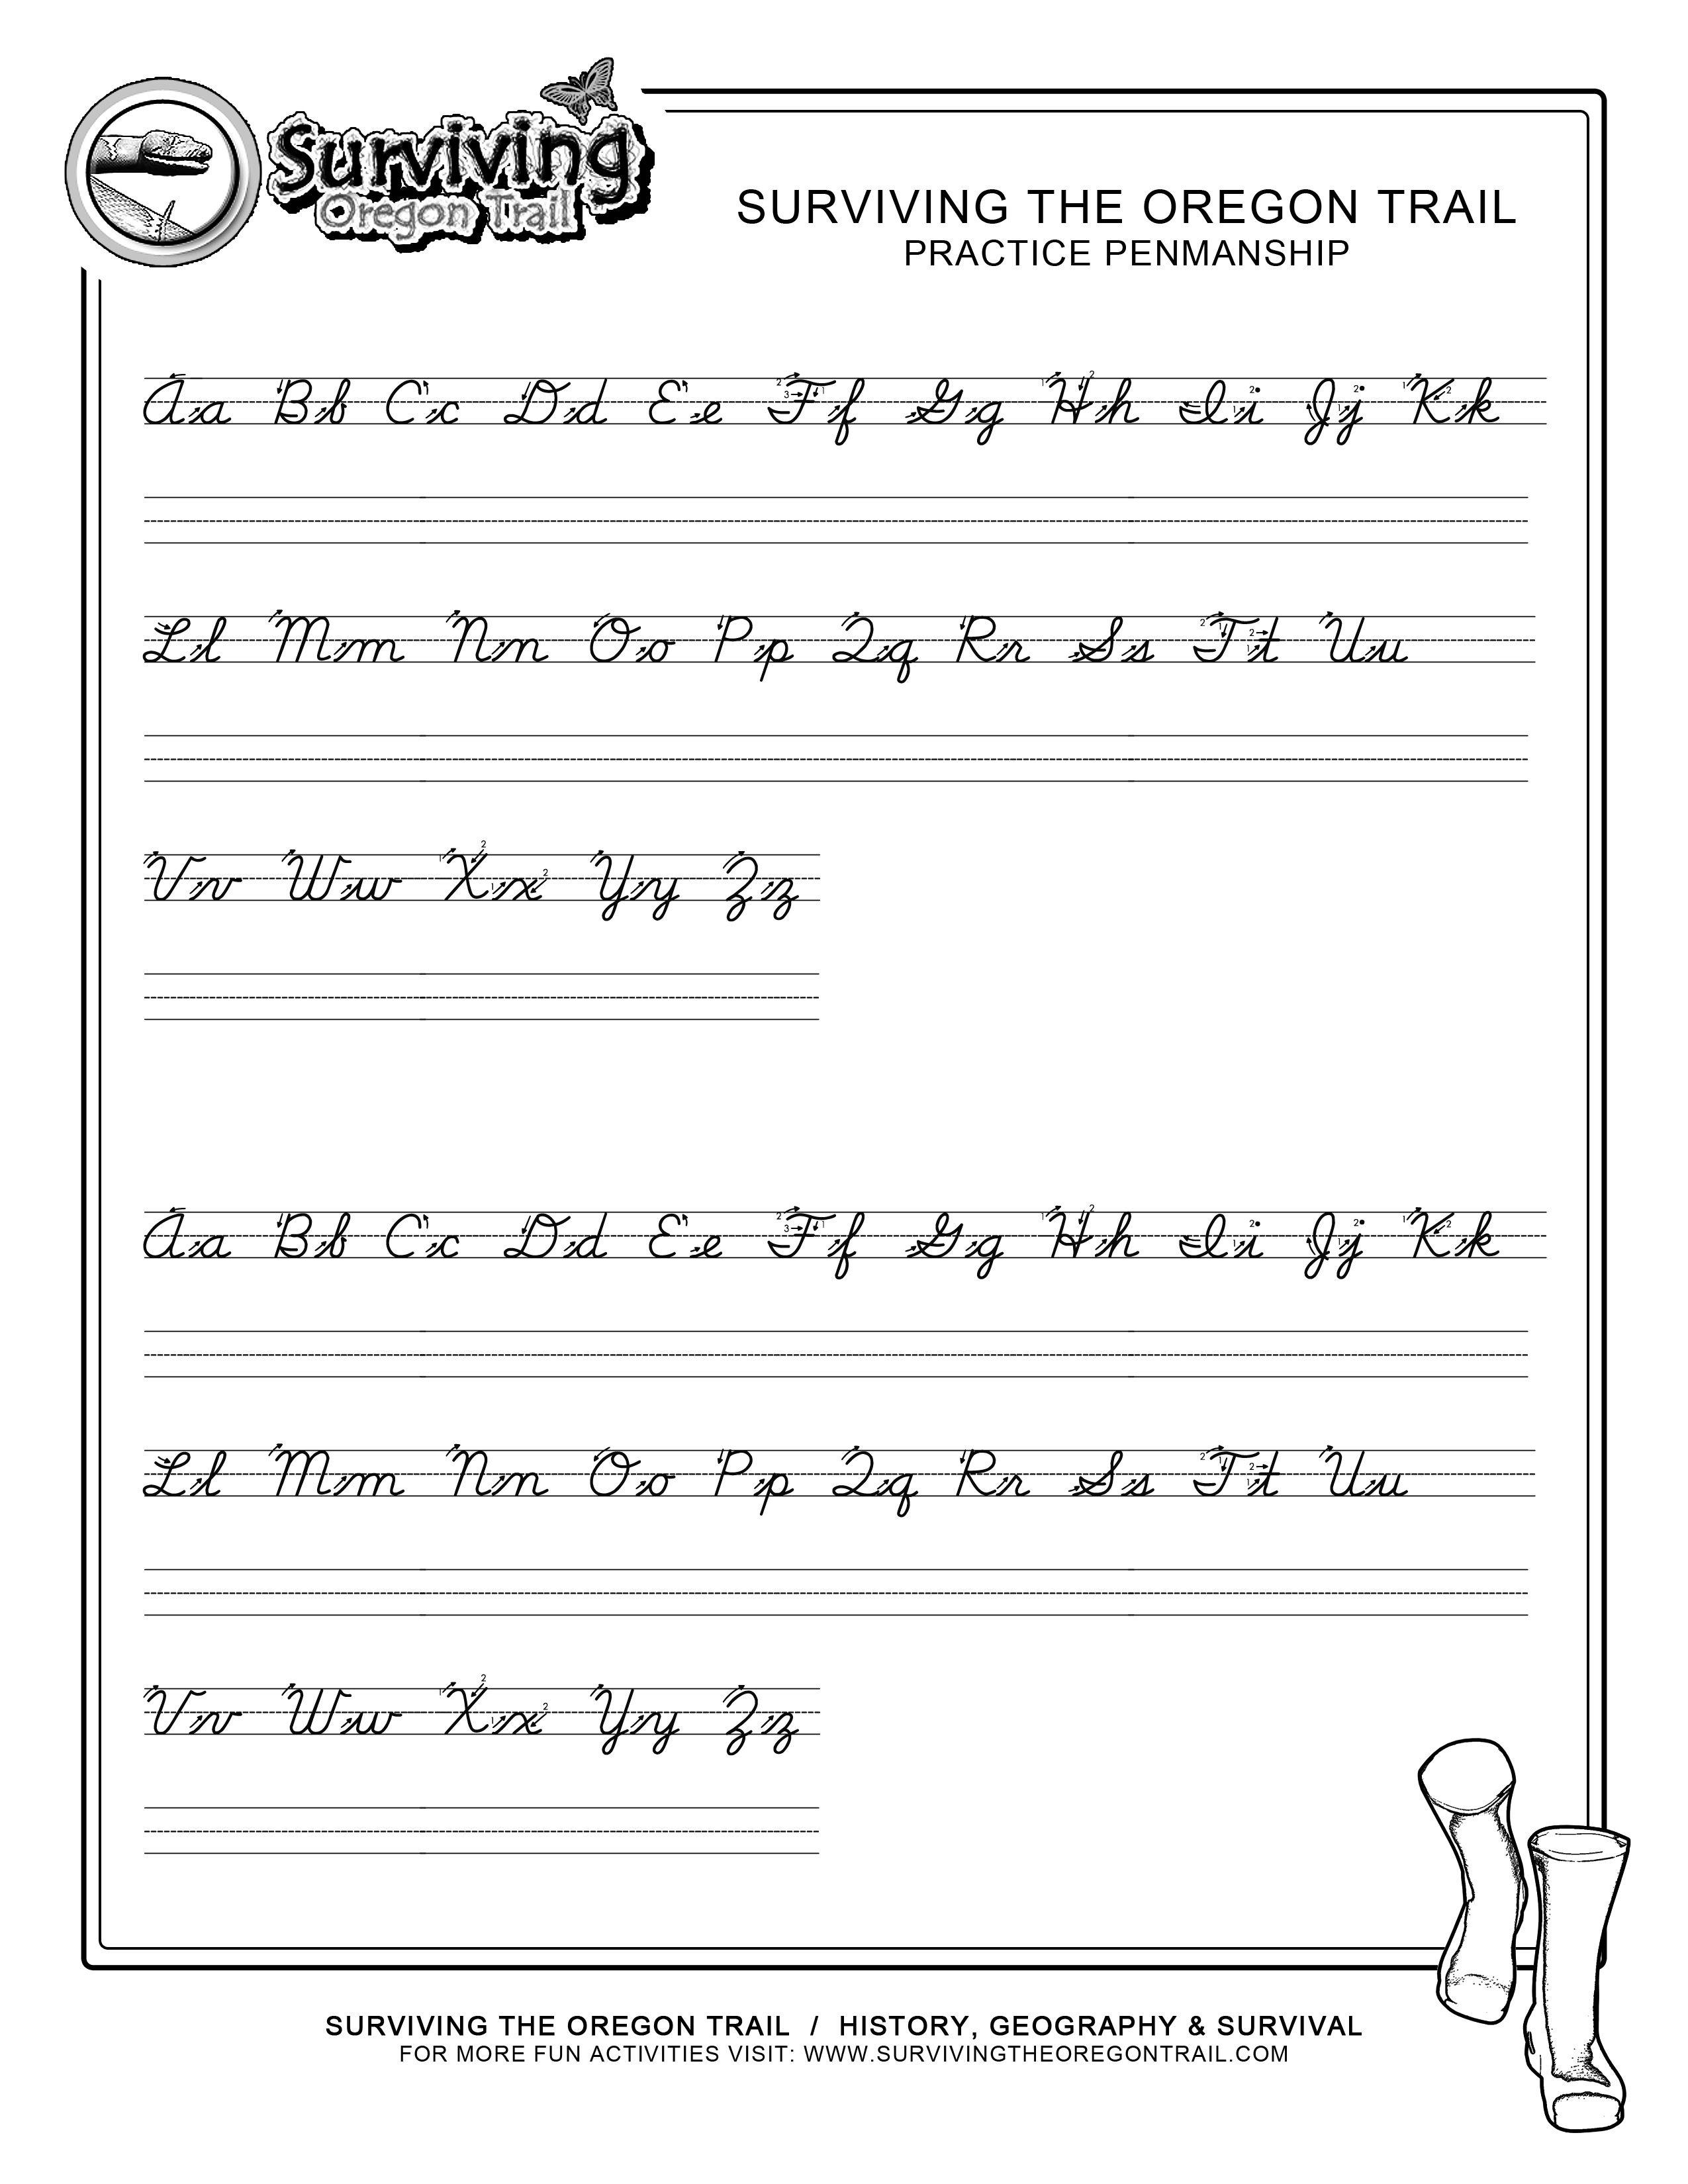 Practice Penmanship – Free Abc's Printable Cursive Writing Worksheet - Free Printable Worksheets Handwriting Practice